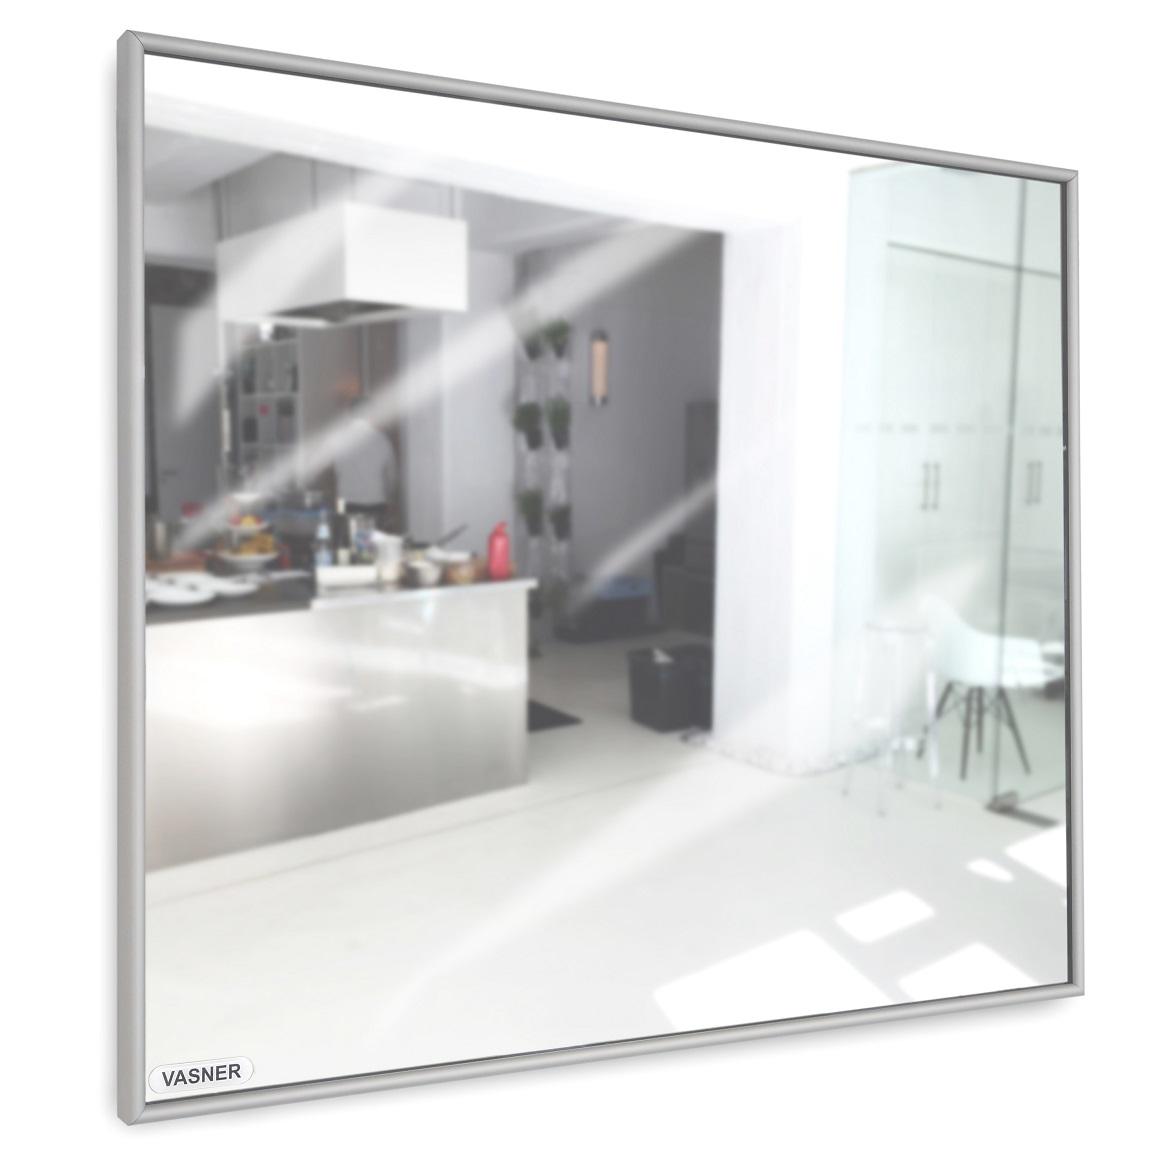 Infrarotheizung-Spiegel-Zipris-Deluxe-Rahmen-Spiegelung-INfrarot